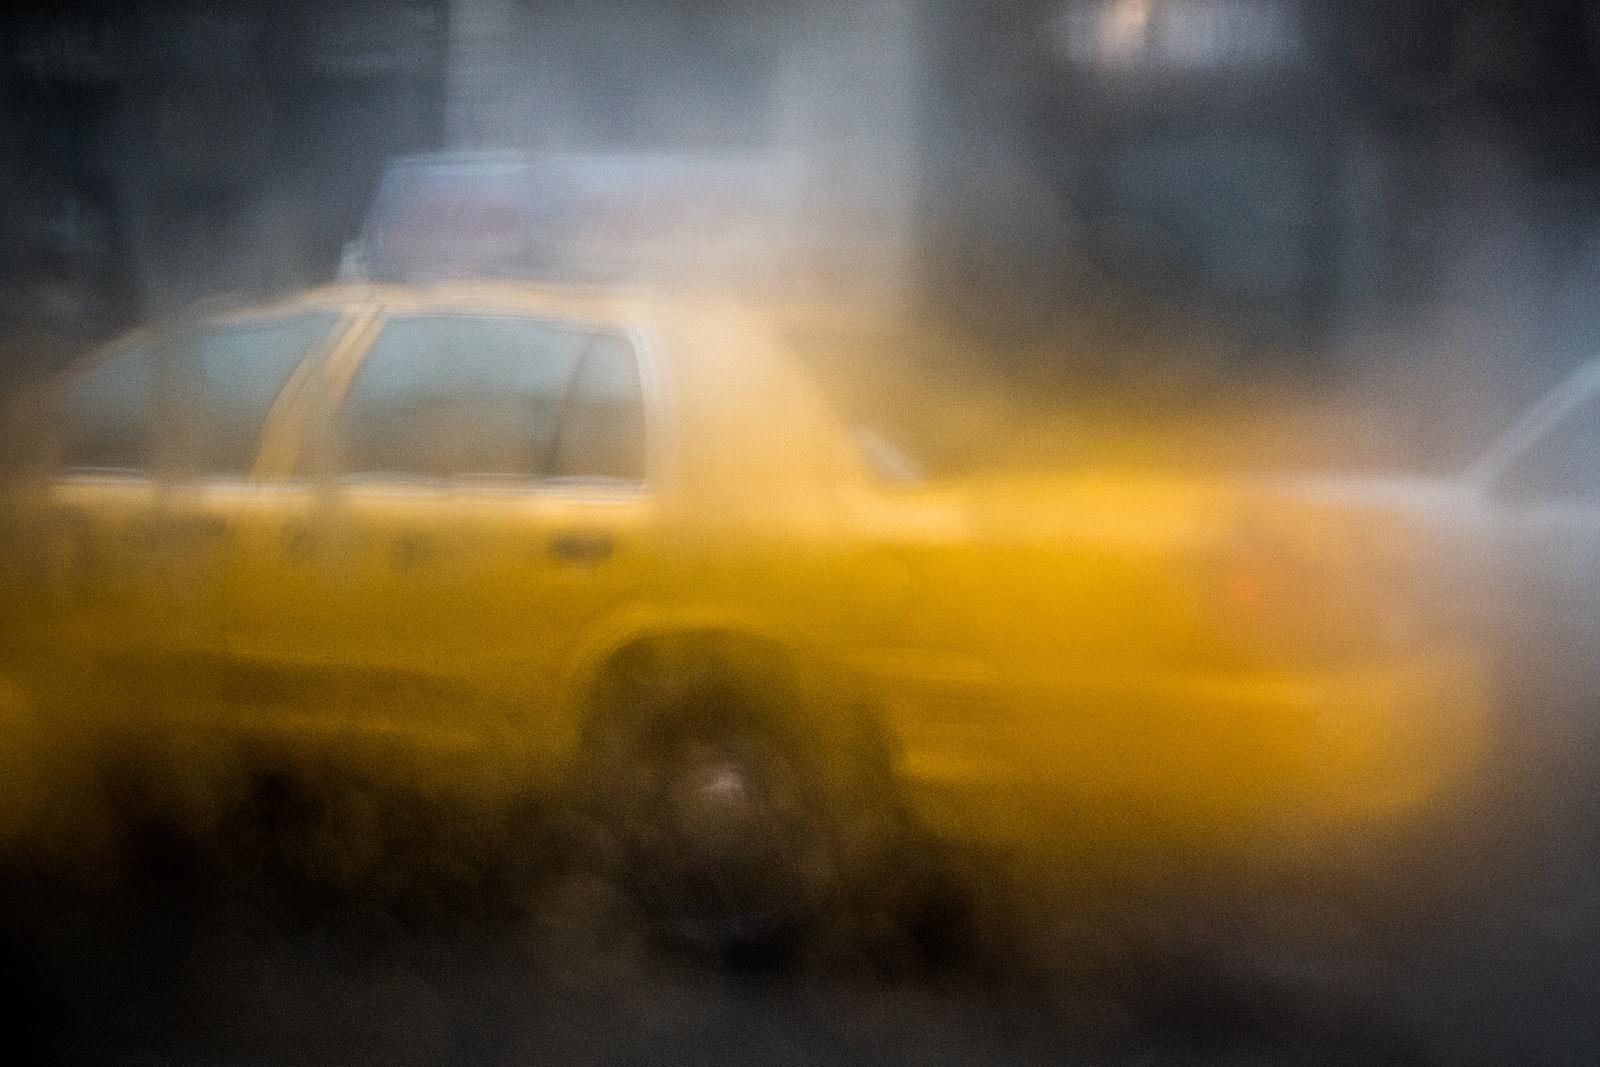 bolfo_0001s_0017_NYC Yellow Cab